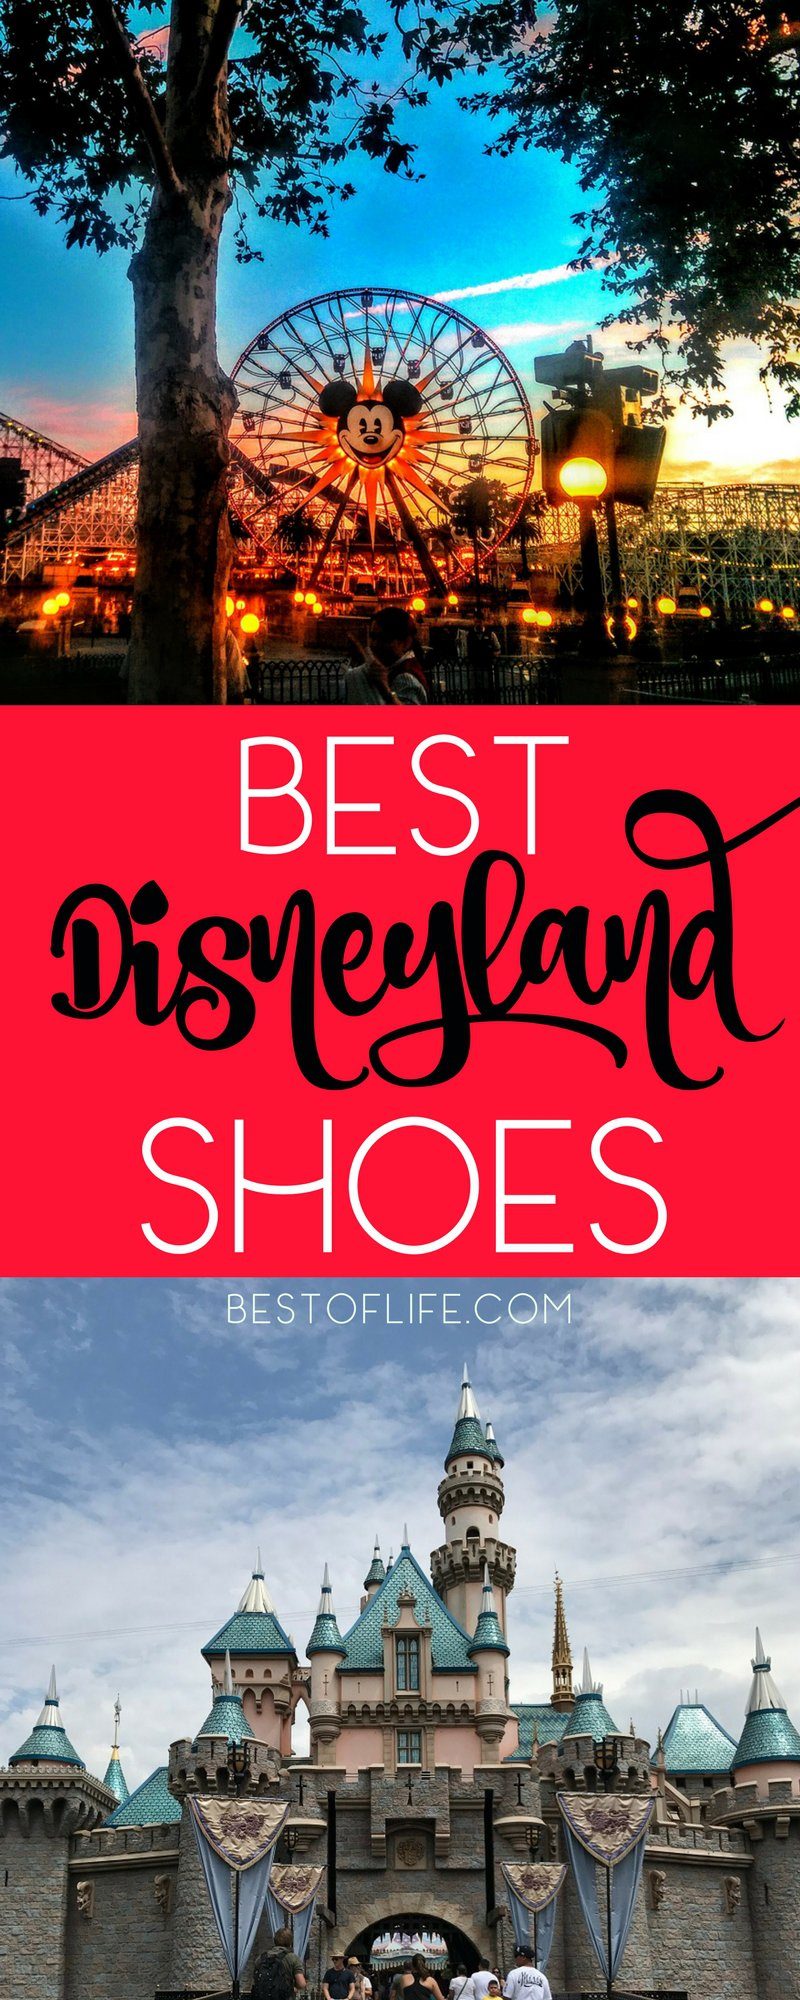 Best Shoes To Walk In Disney World